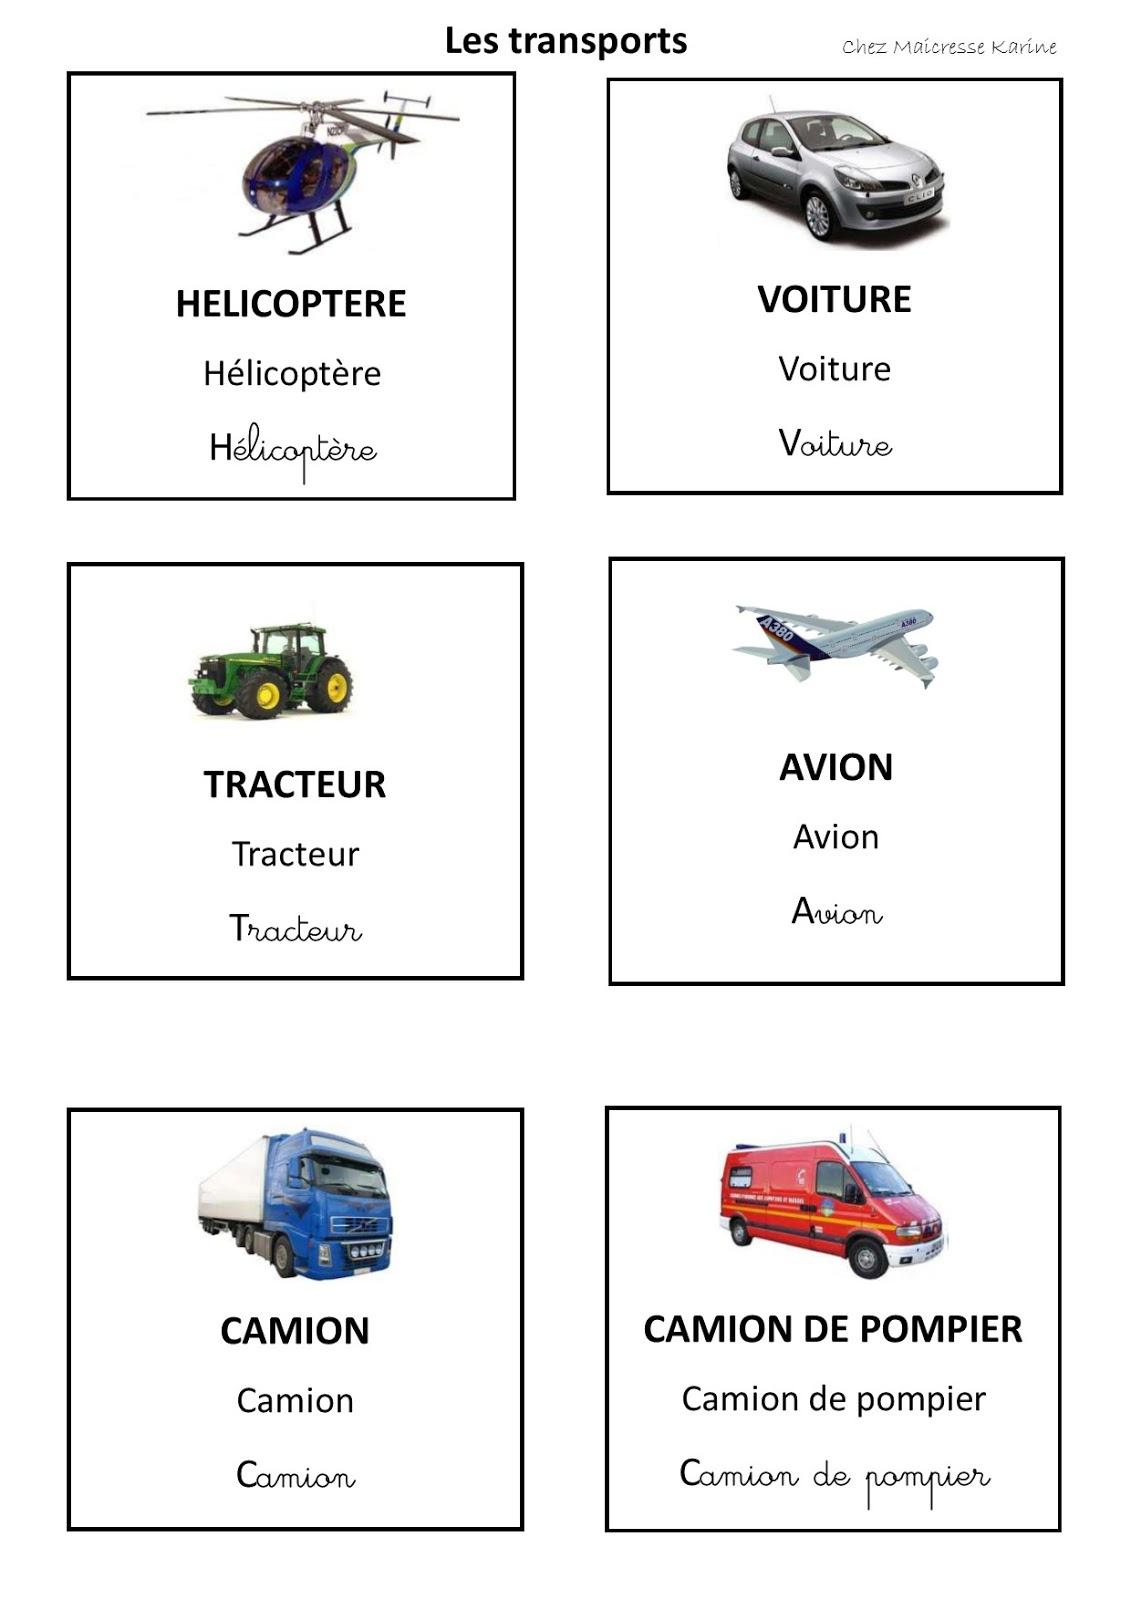 Chez Maicresse Karine: Cartes De Nomenclature Les Transports dedans Maicresse Karine